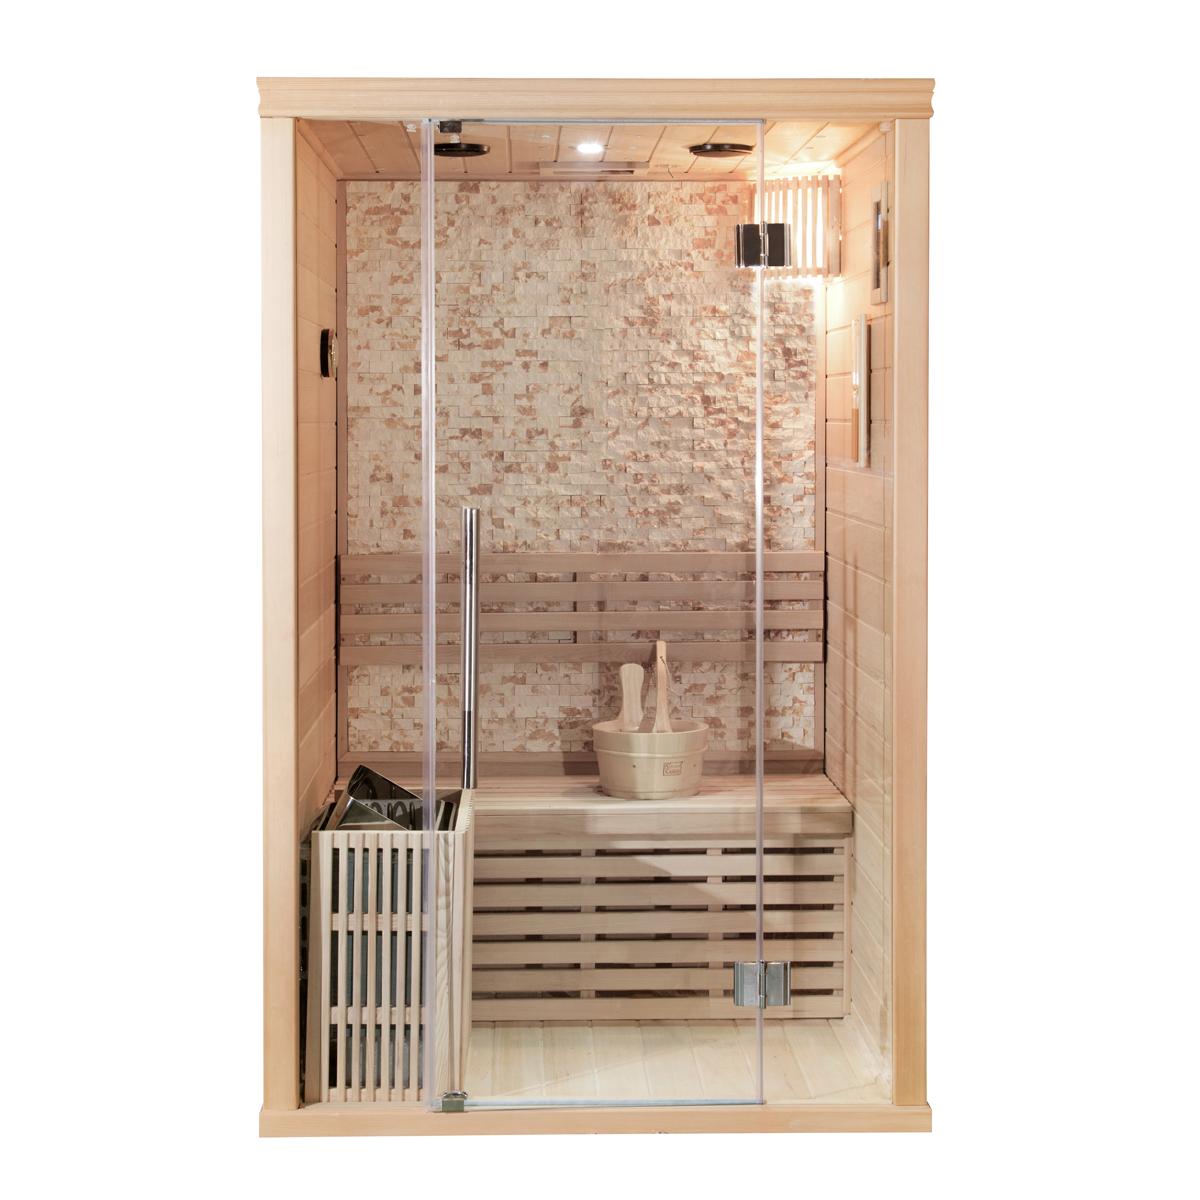 Beliebt Compacte Sauna - 2 Personen   Deals2Day CP05